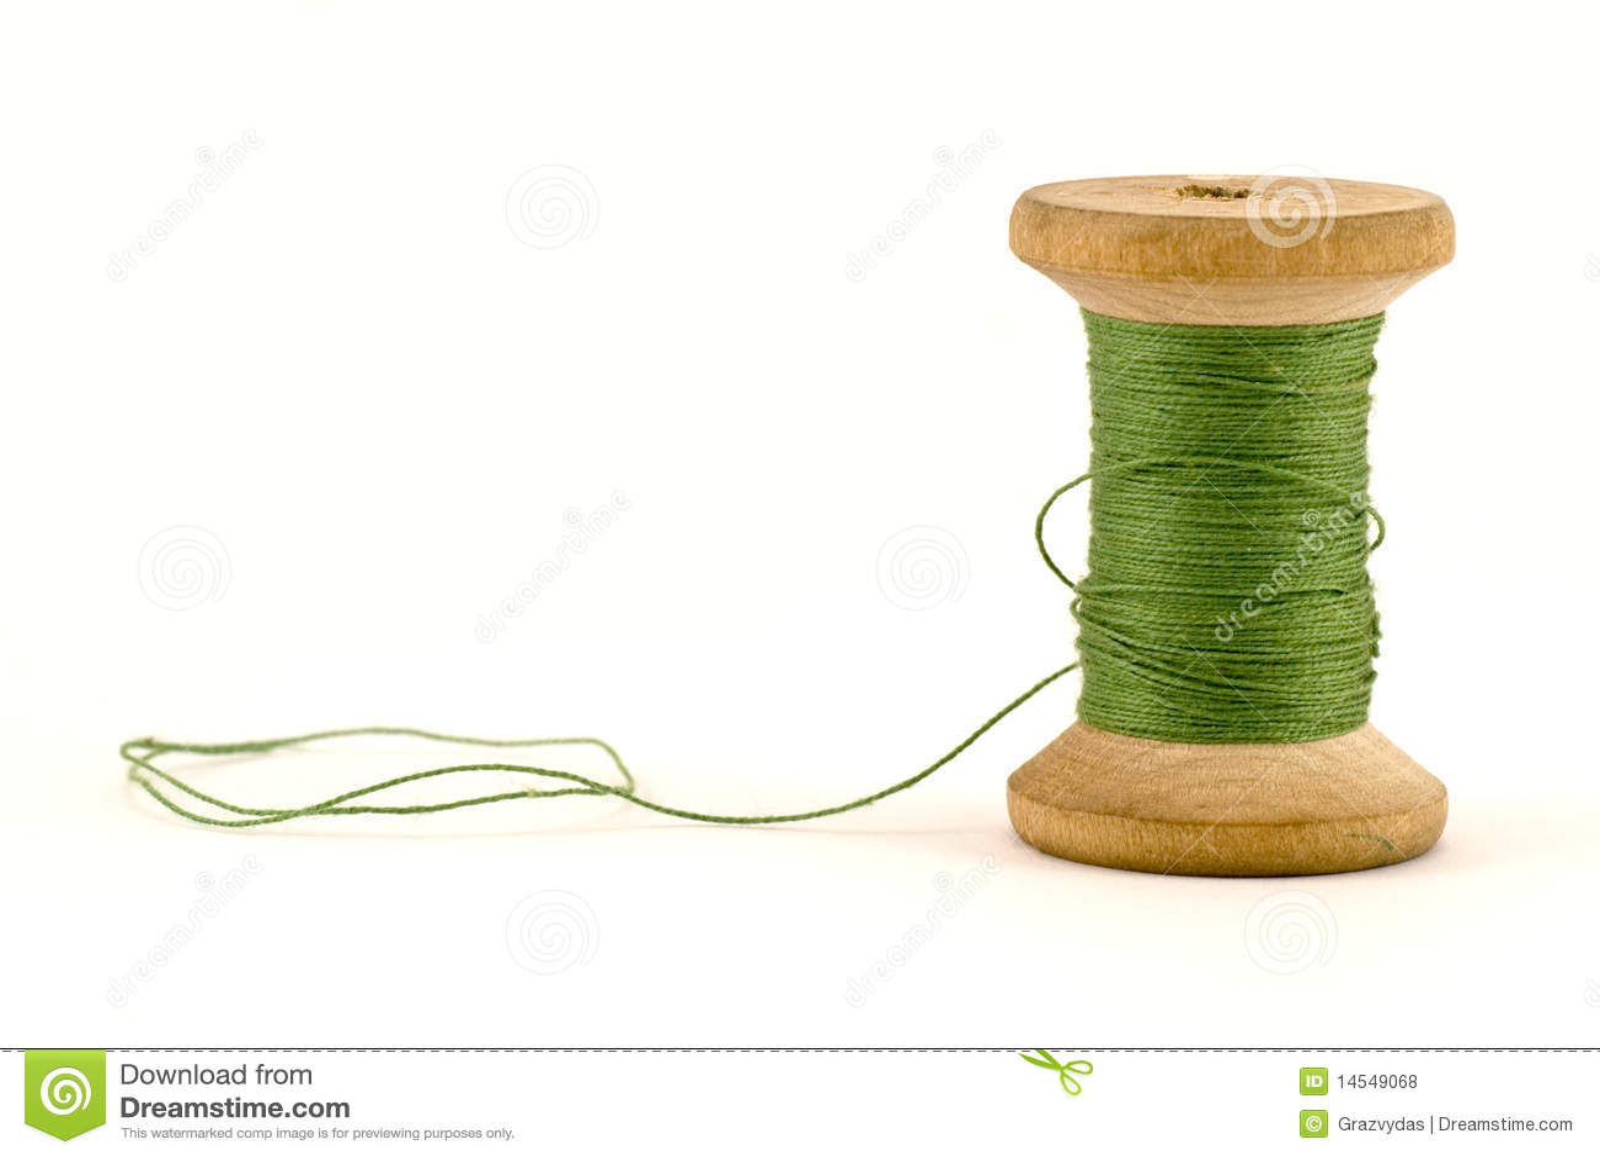 Green thread spool